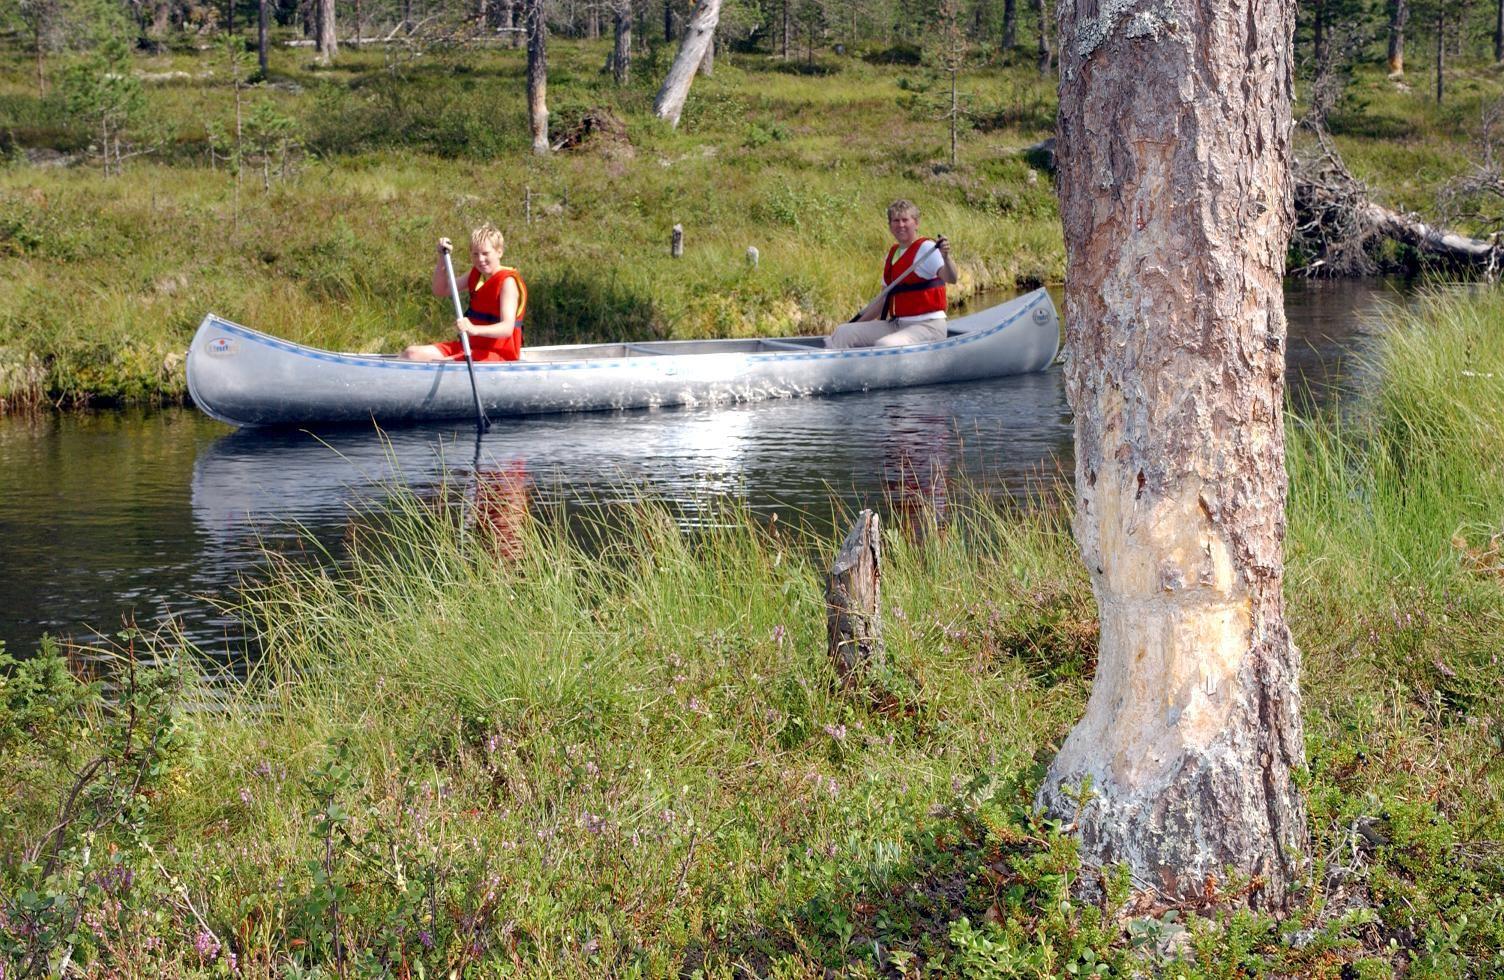 Idre Turistservice, Bäversafari i Idre